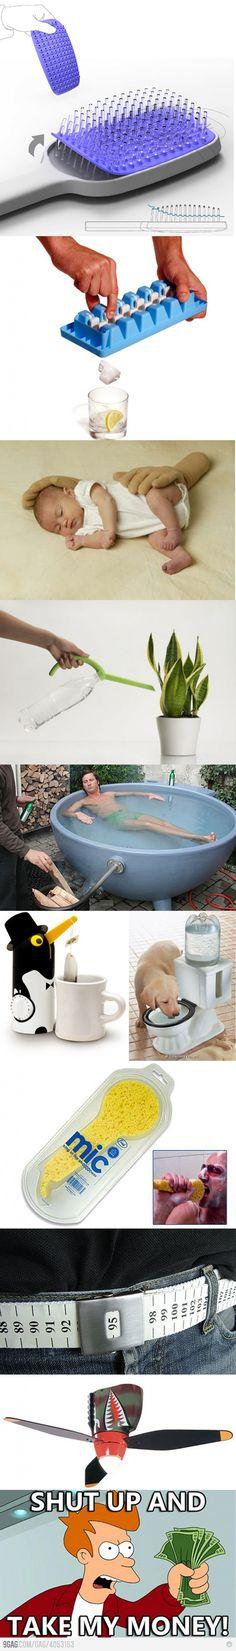 Cool Inventions! Love da hairbrush 1